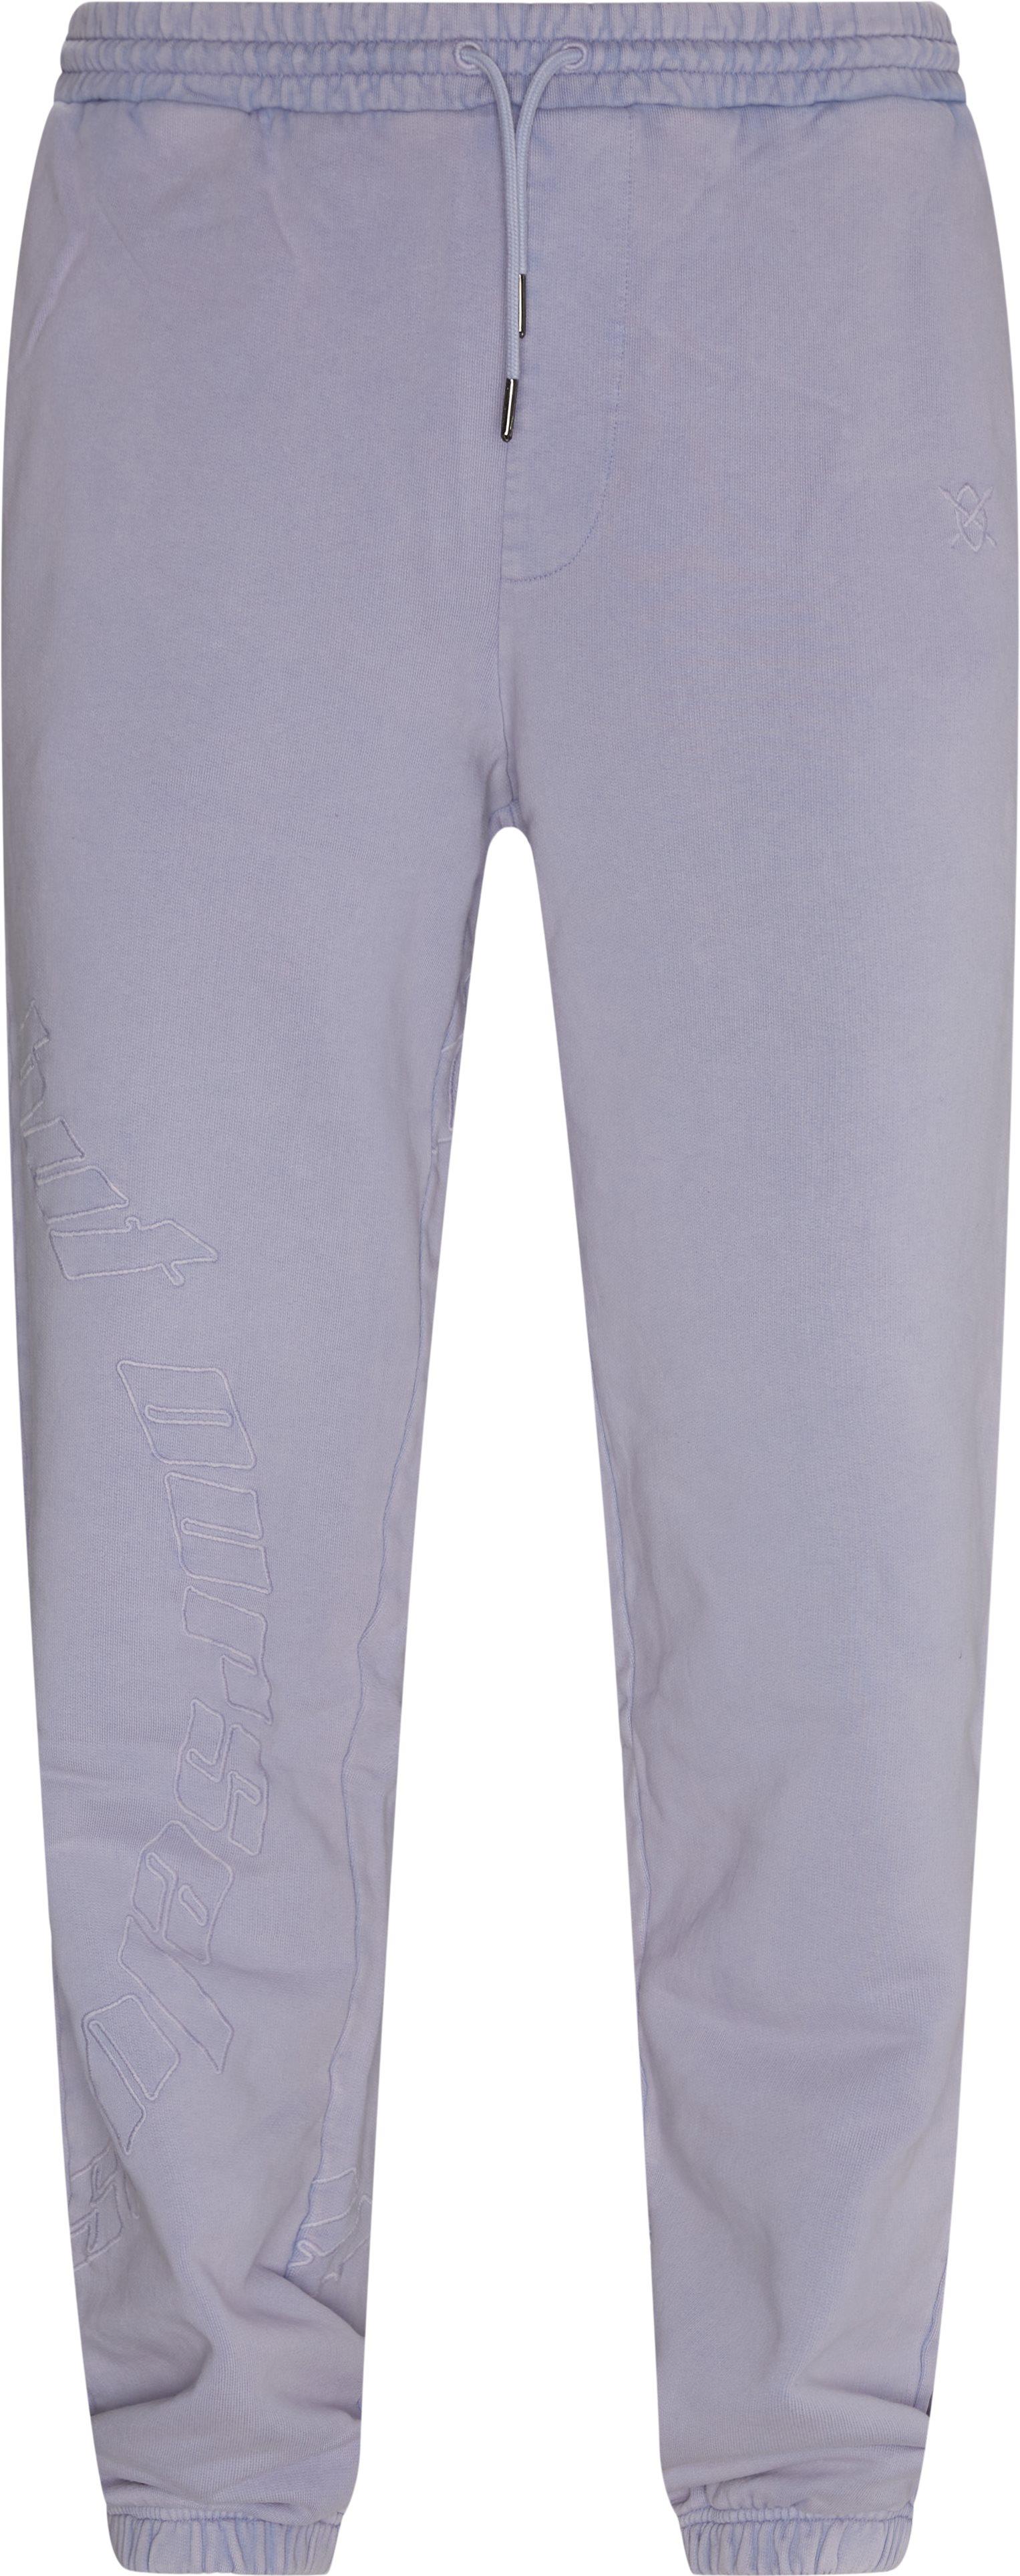 Kacid Pants - Bukser - Regular fit - Lilla